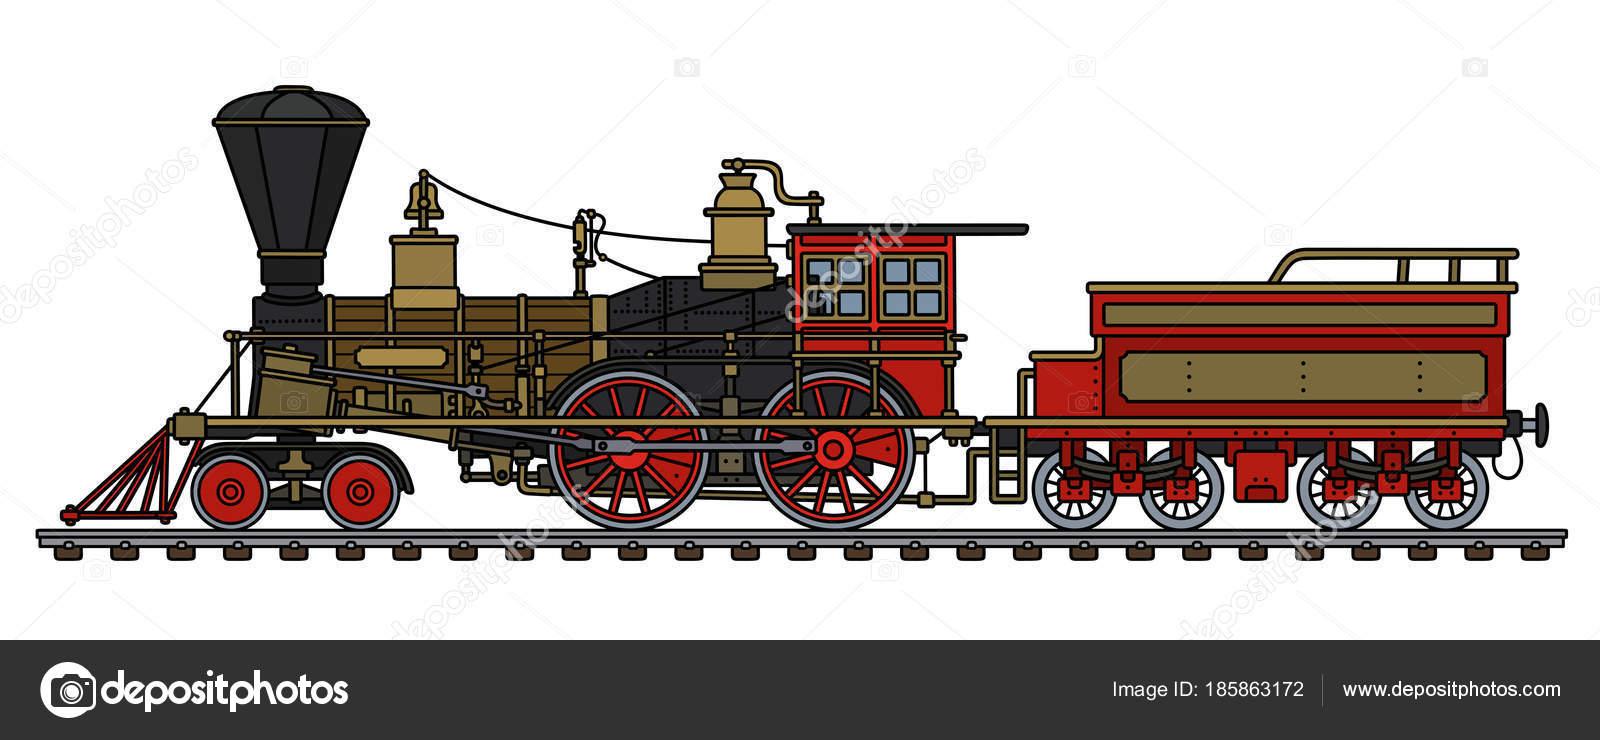 Drawings: steam locomotive   Hand Drawing Vintage Red